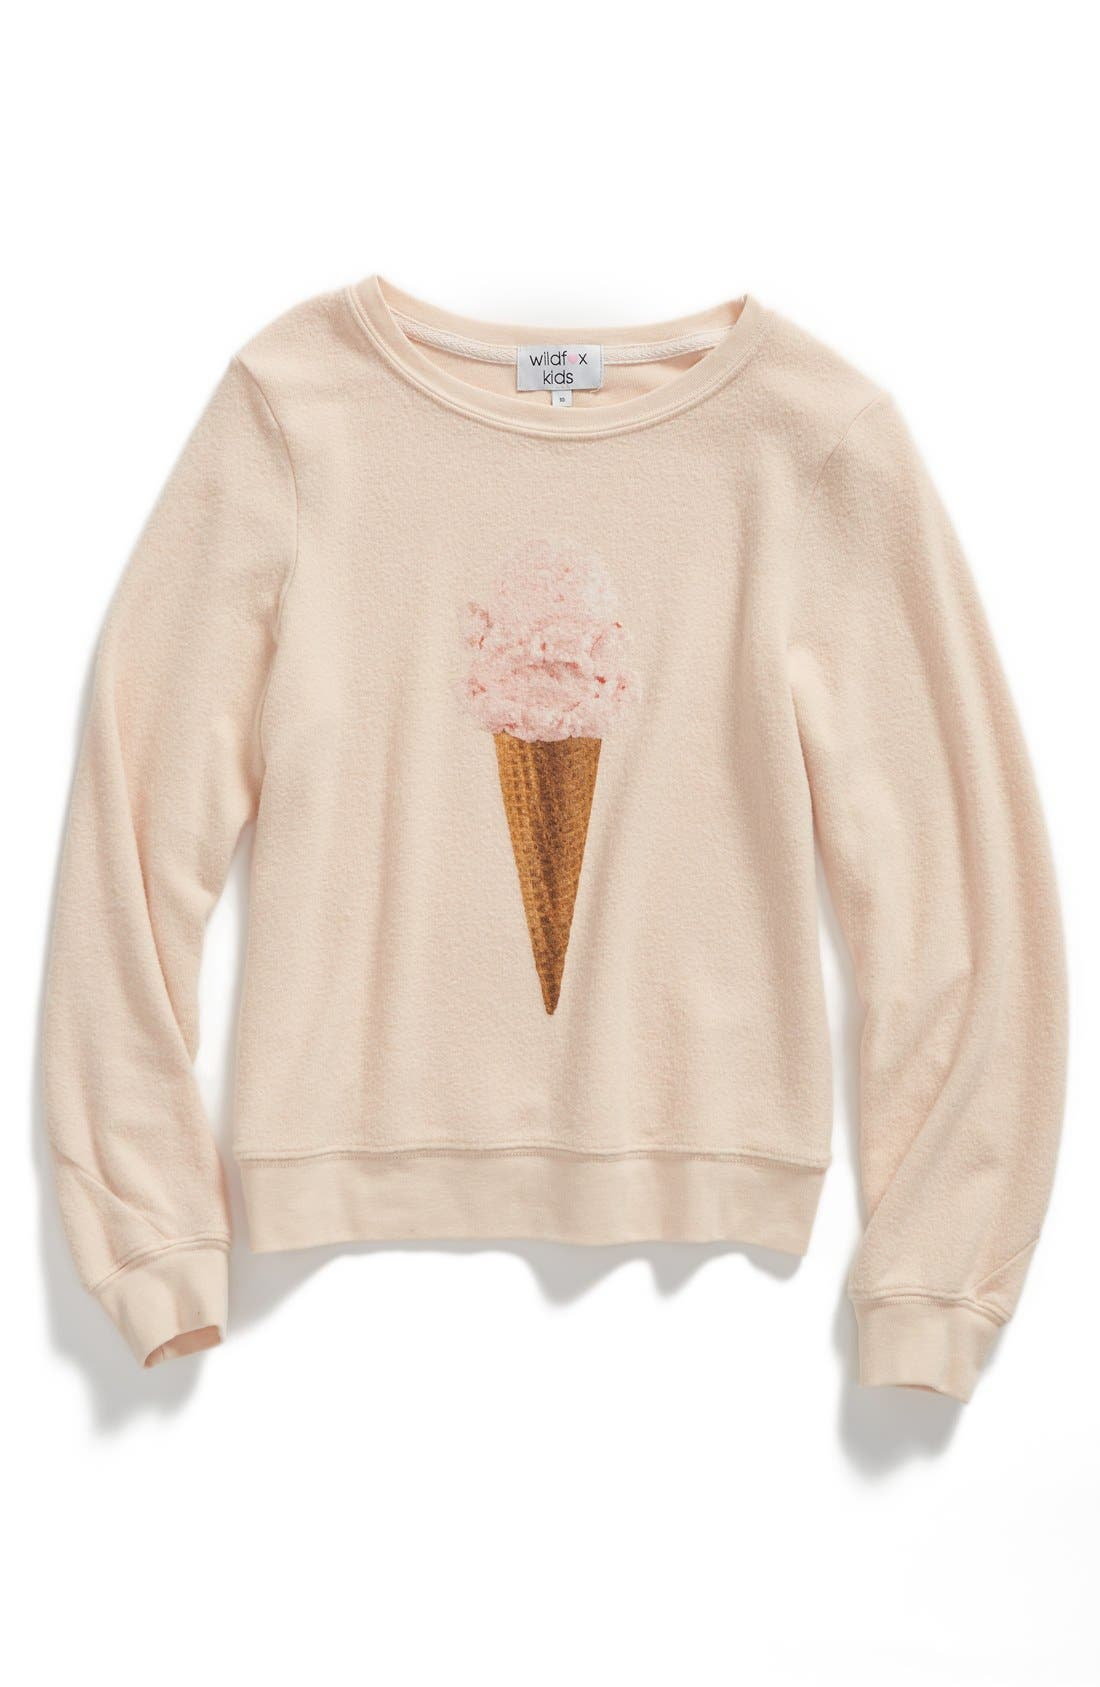 Main Image - Wildfox 'Breakfast - Baggy Beach Jumper' Sweatshirt (Little Girls & Big Girls)